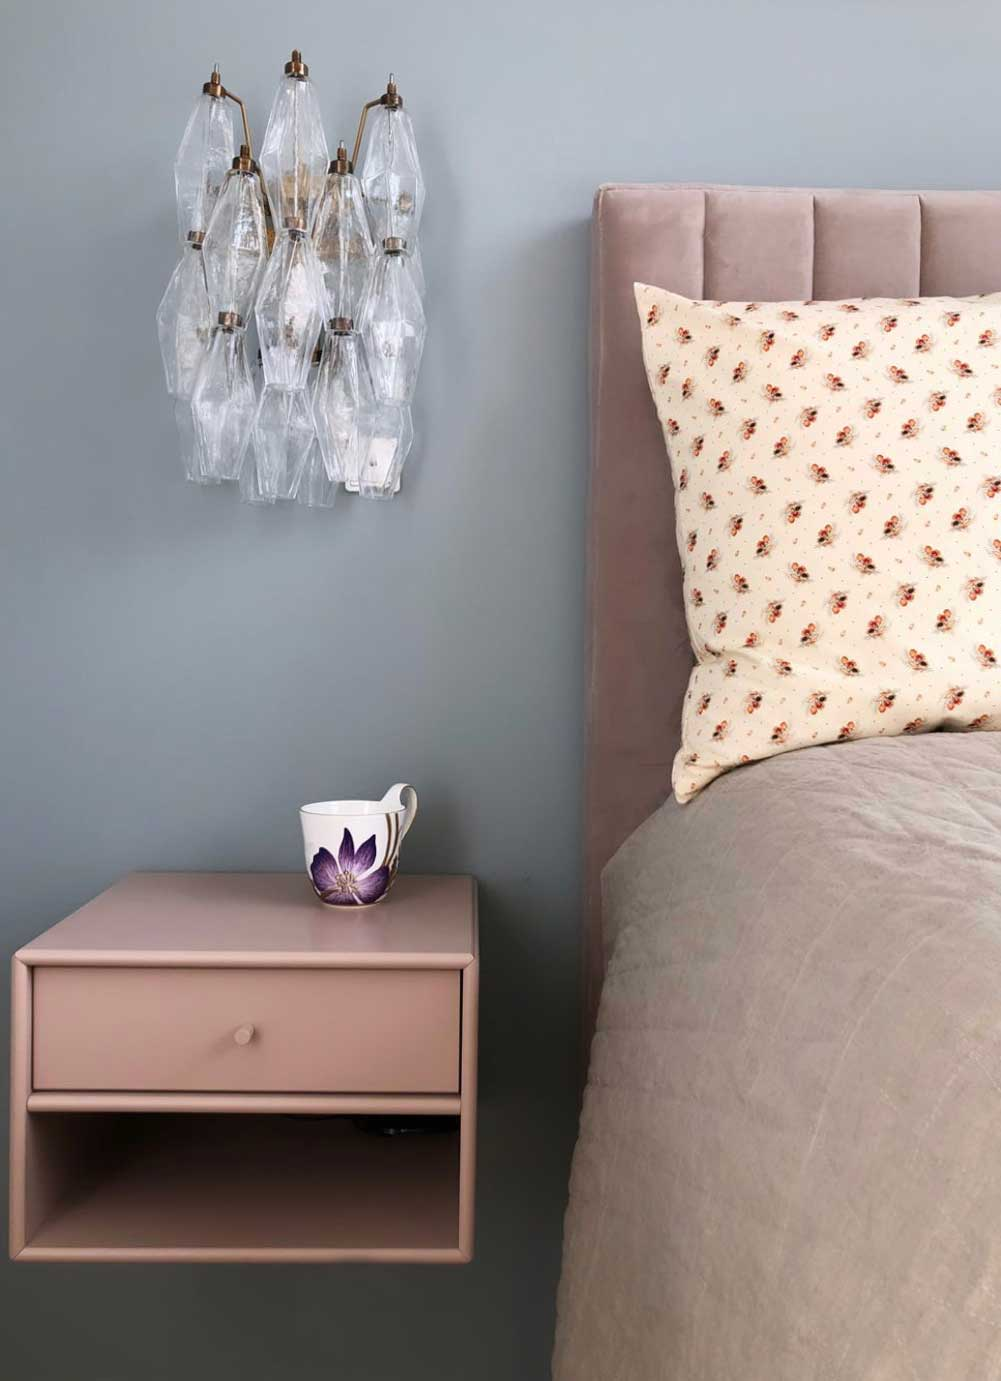 murano væglamper nanna wistoft design